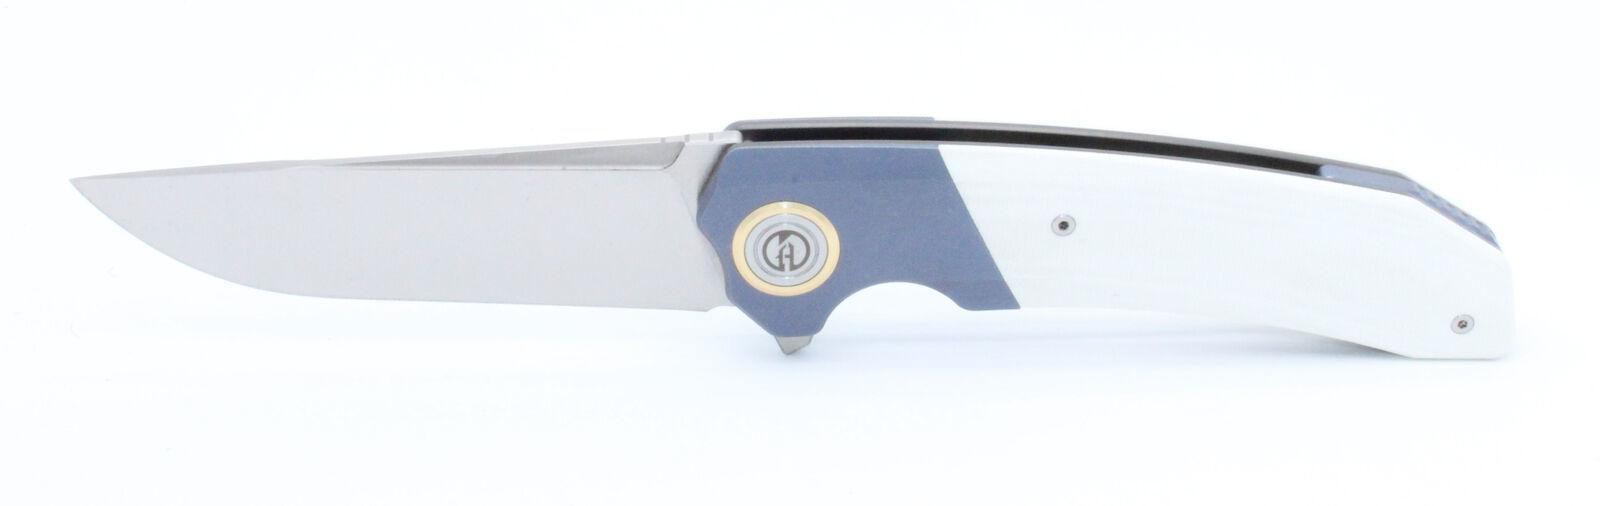 Складной нож Maxace Goliath Steel White , сталь Bohler K110